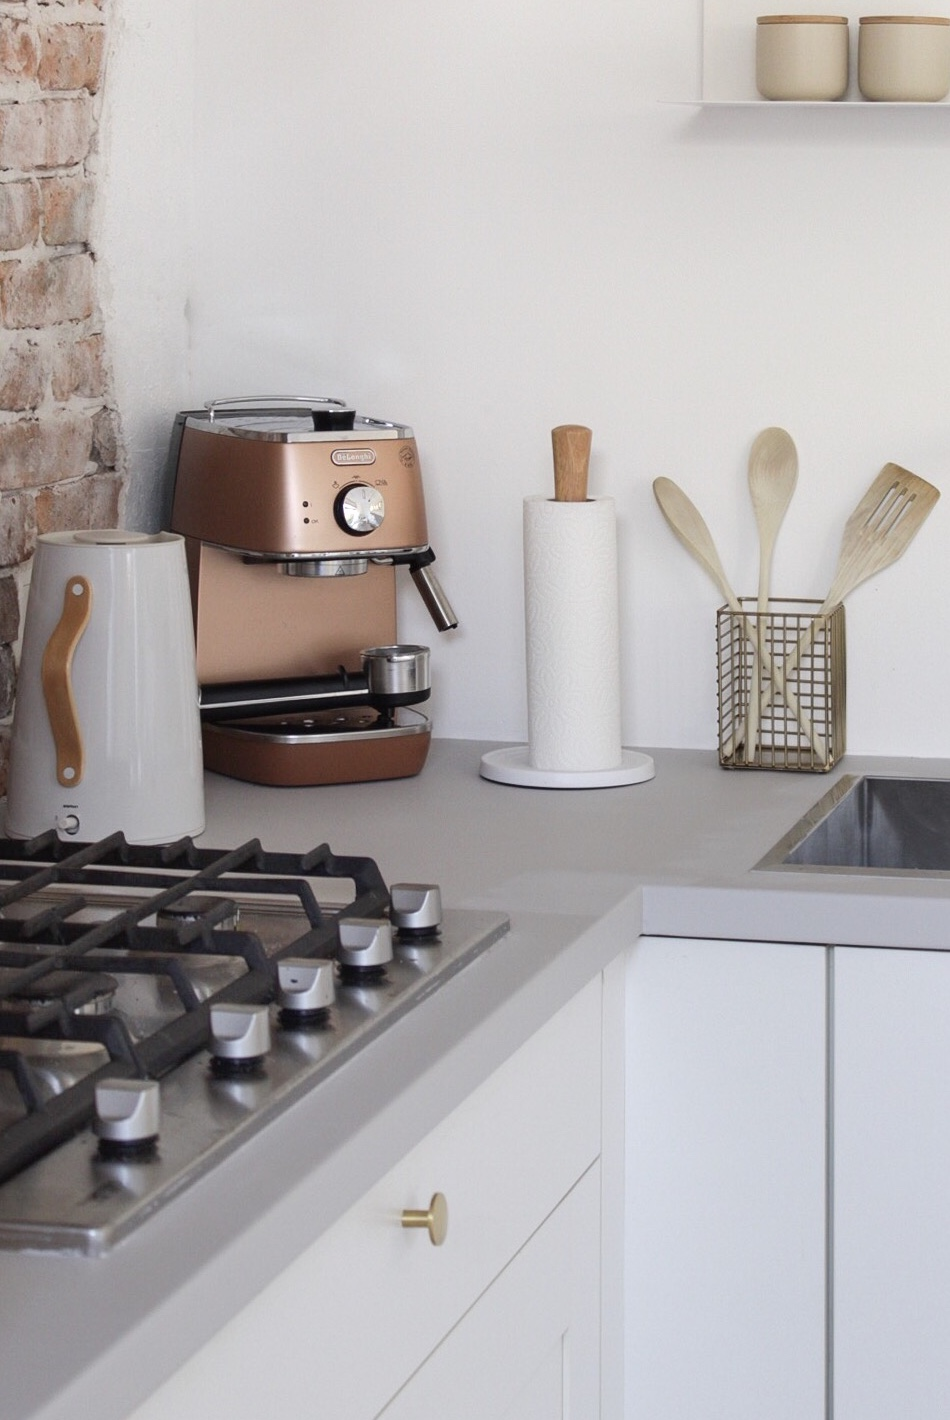 keuken makeover, keuken, keukenspullen, keukeninspiratie, Stelton, RIG-TIG, interieurinspiratie, thathomepage, (th)athomepage, interieurblog